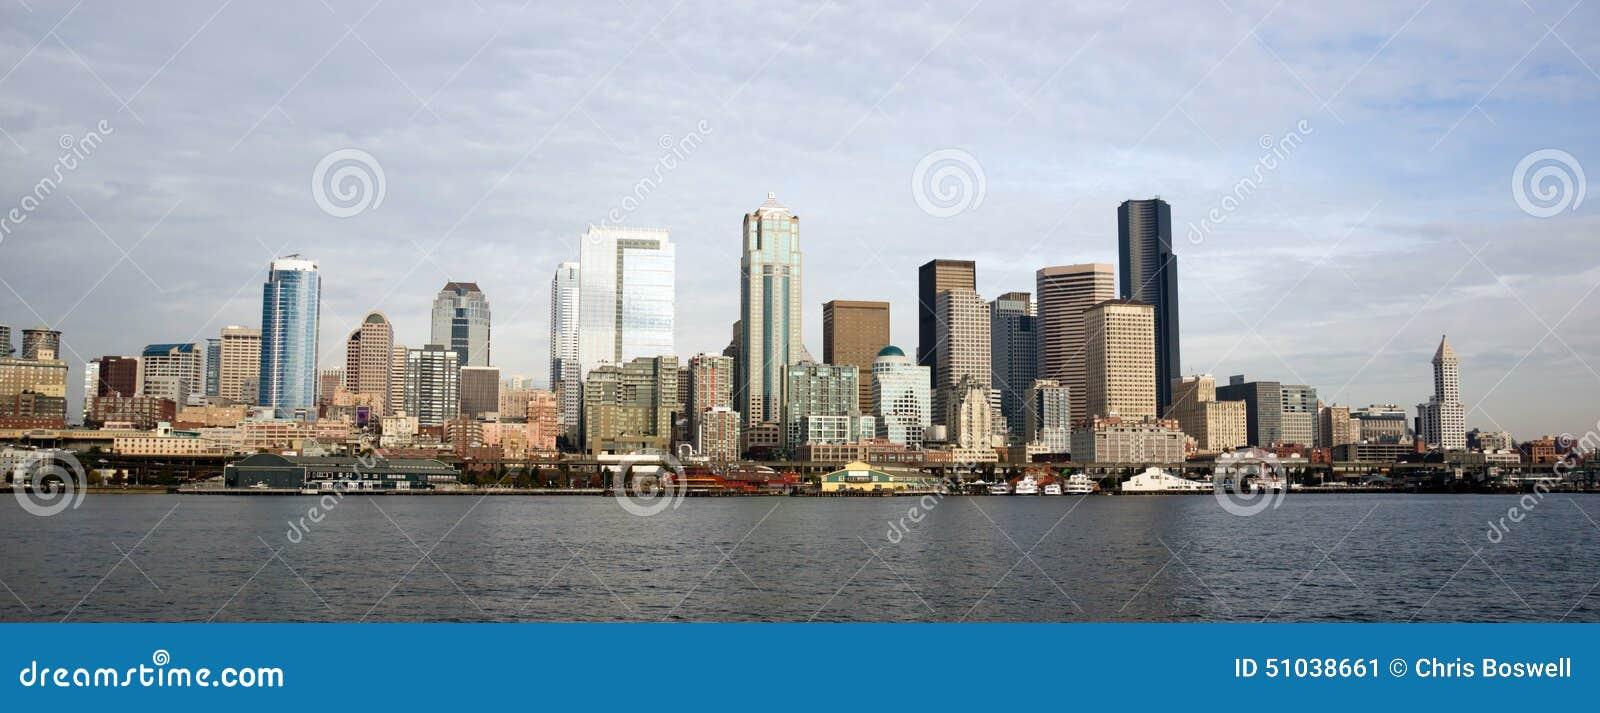 Buildings Piers Elliott Bay Puget Sound Seattle City Skyline Water